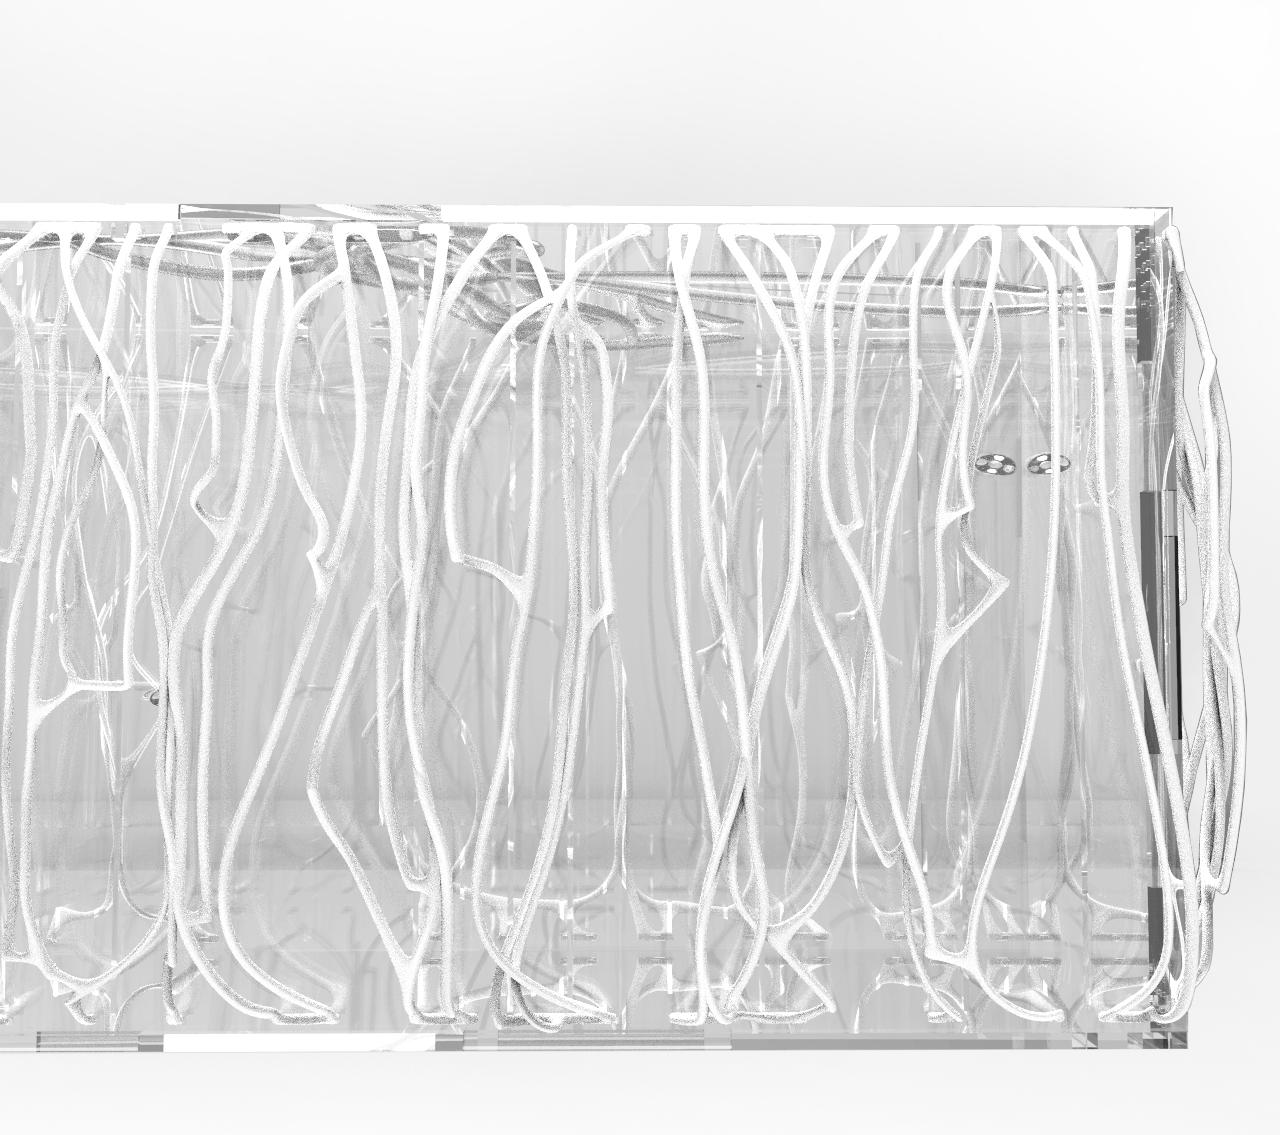 box 2017 - anna janiak studio image 2